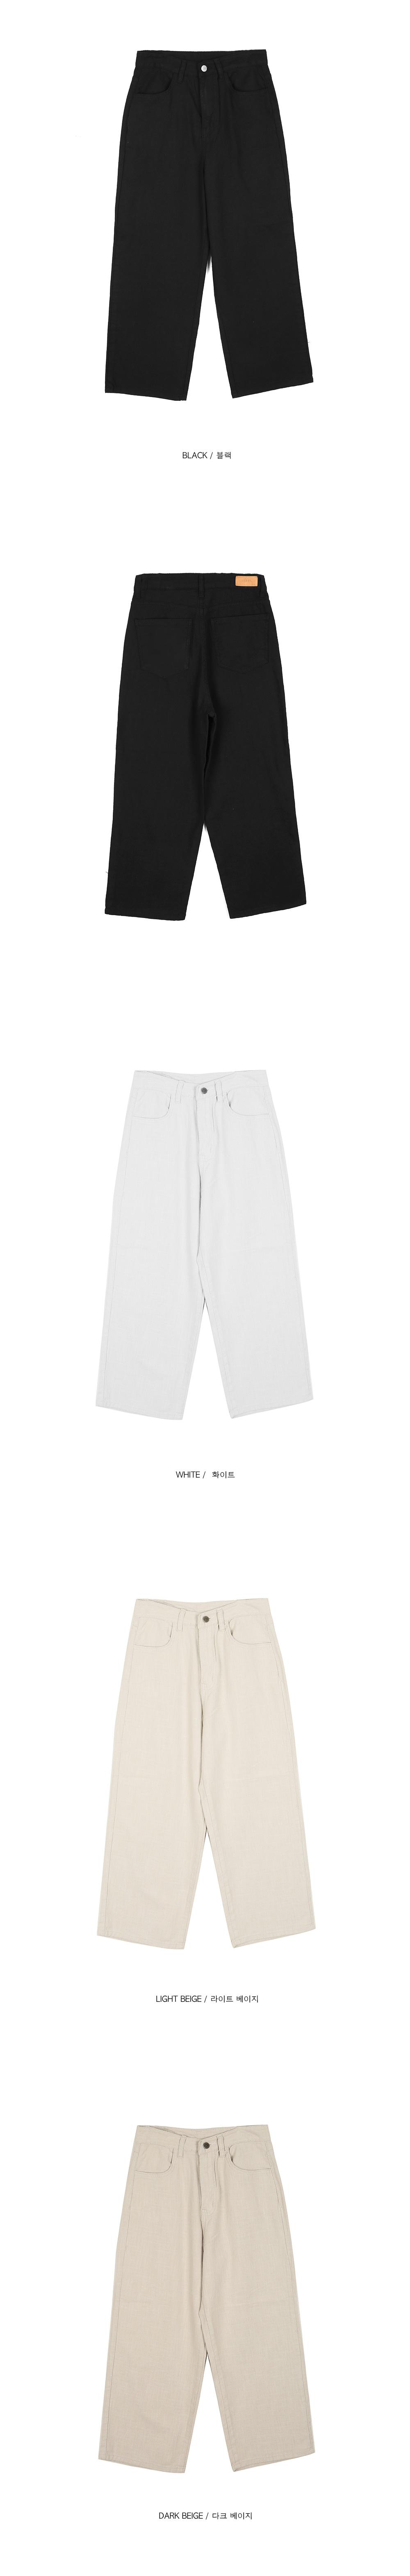 SALE summer crop straight pants (4 color) - woman